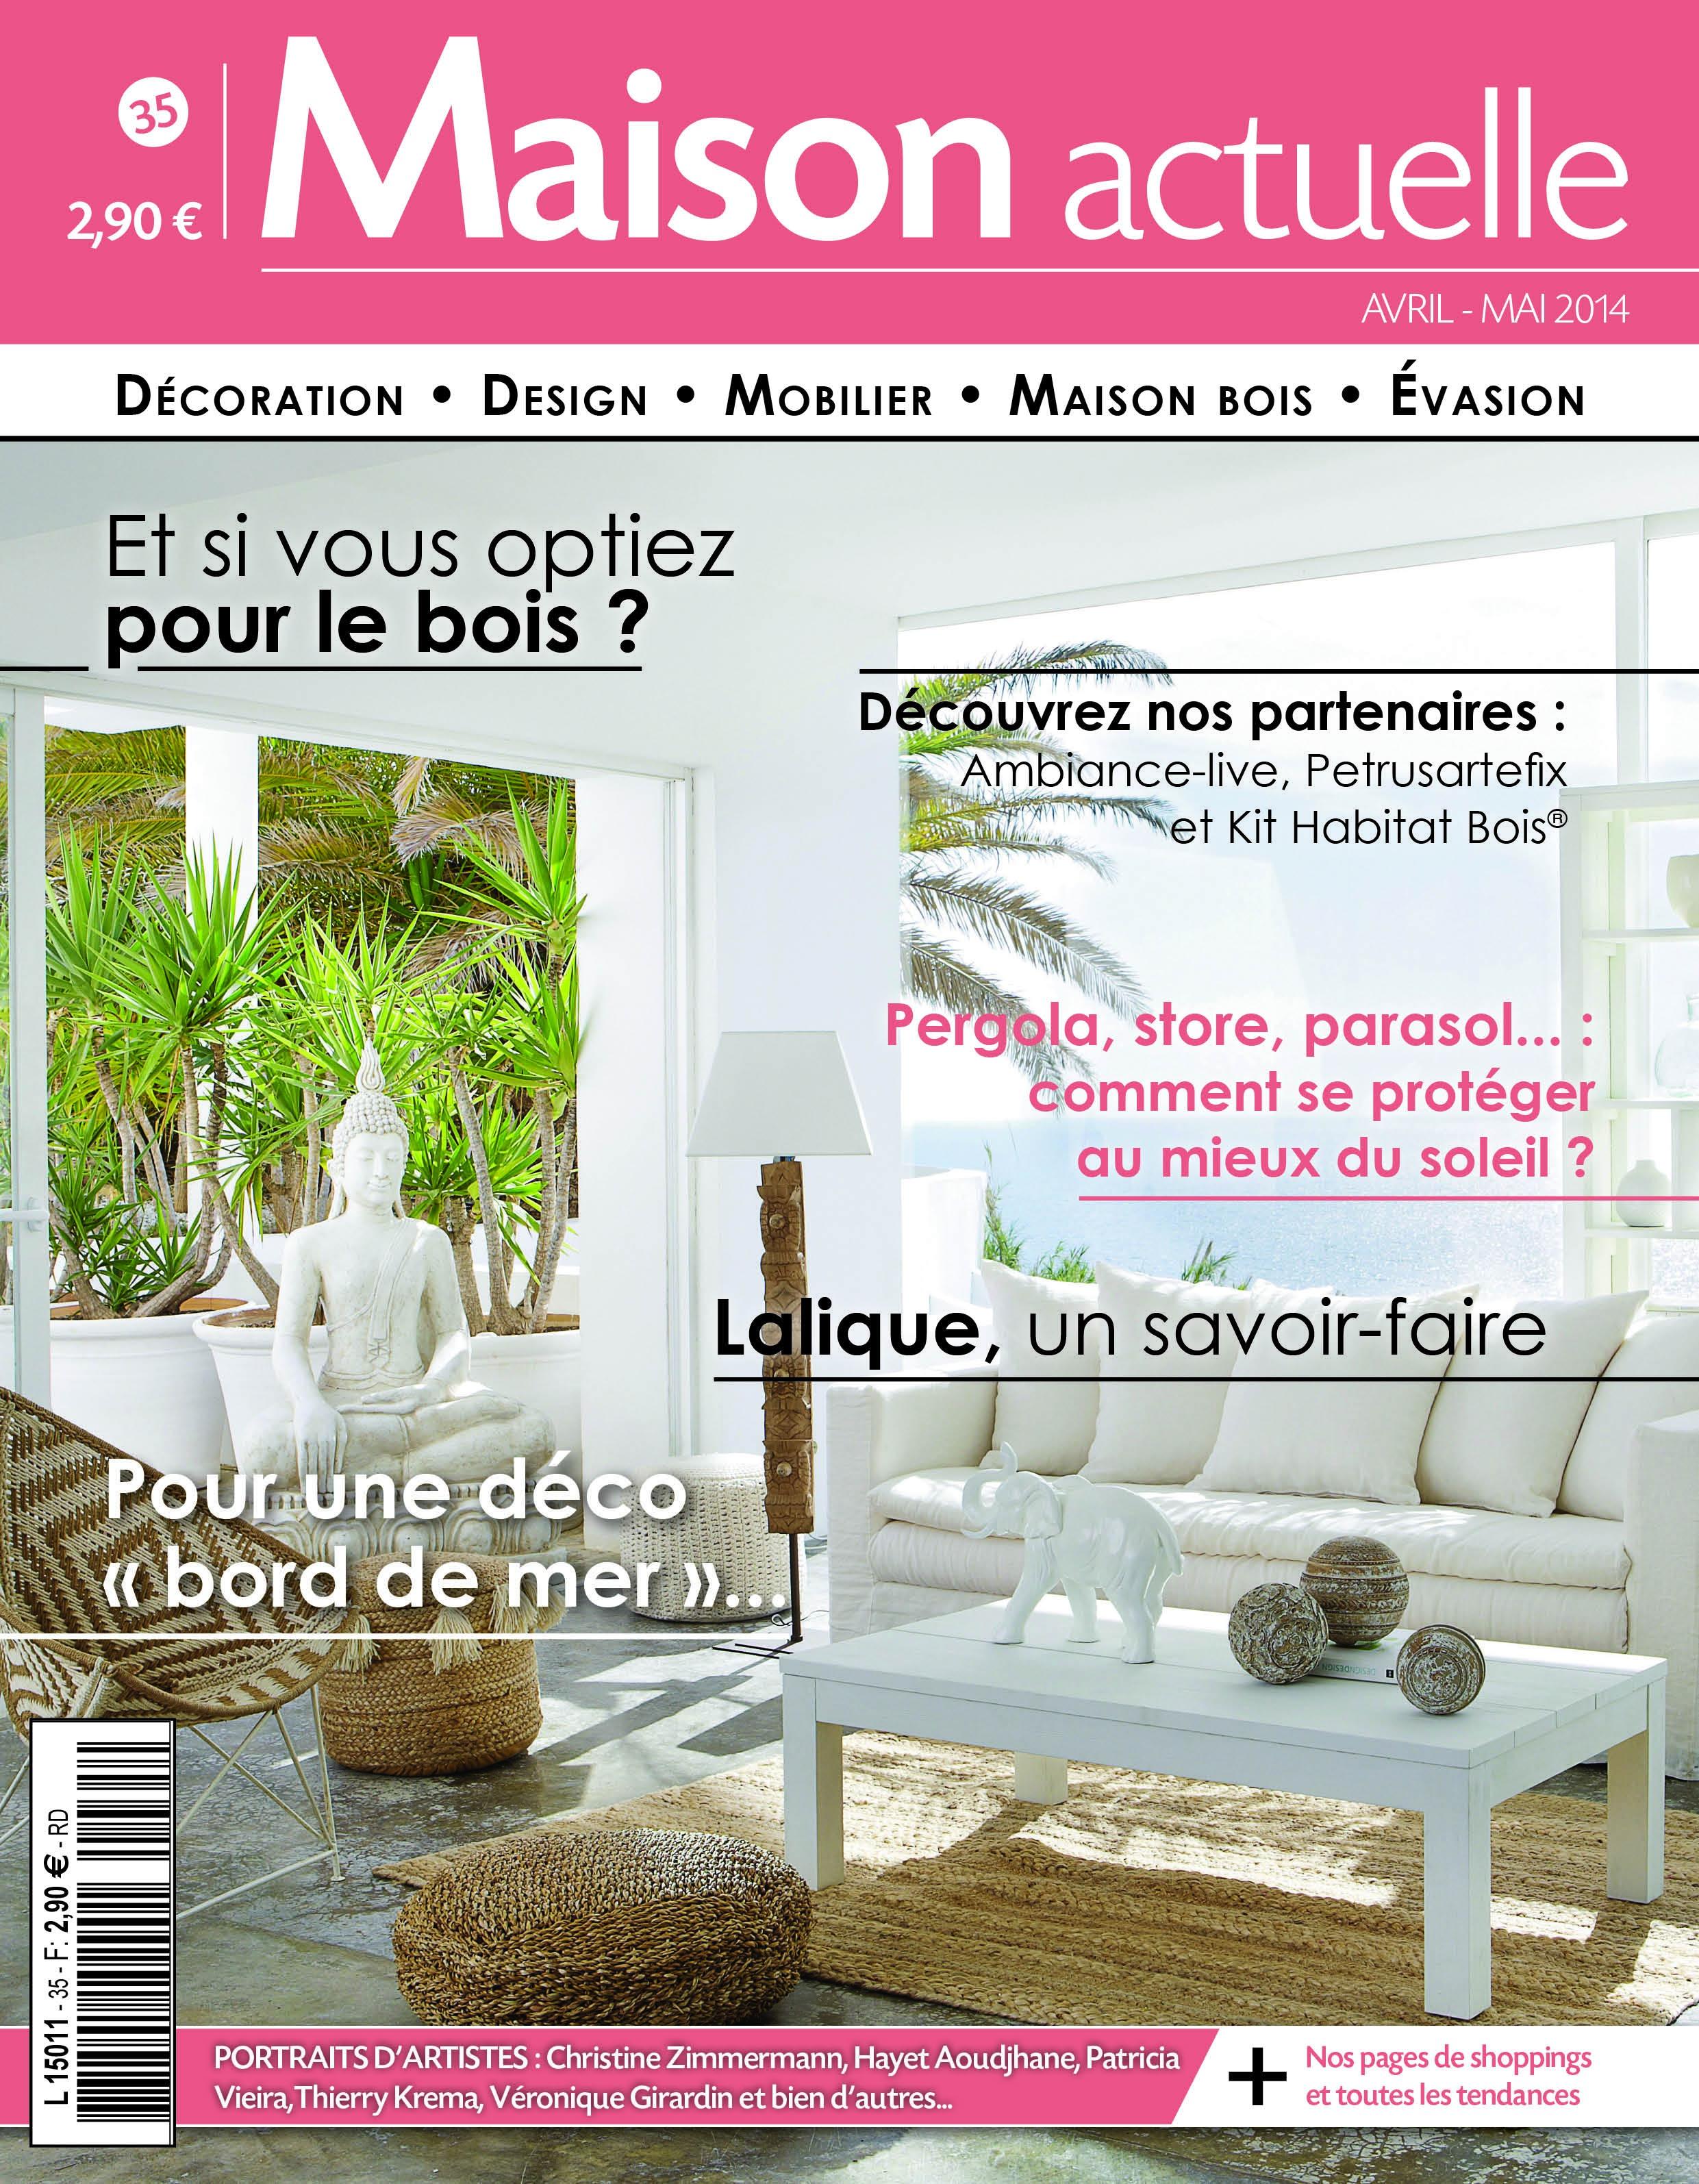 1405-dressmytv-cover-maisonactuelle